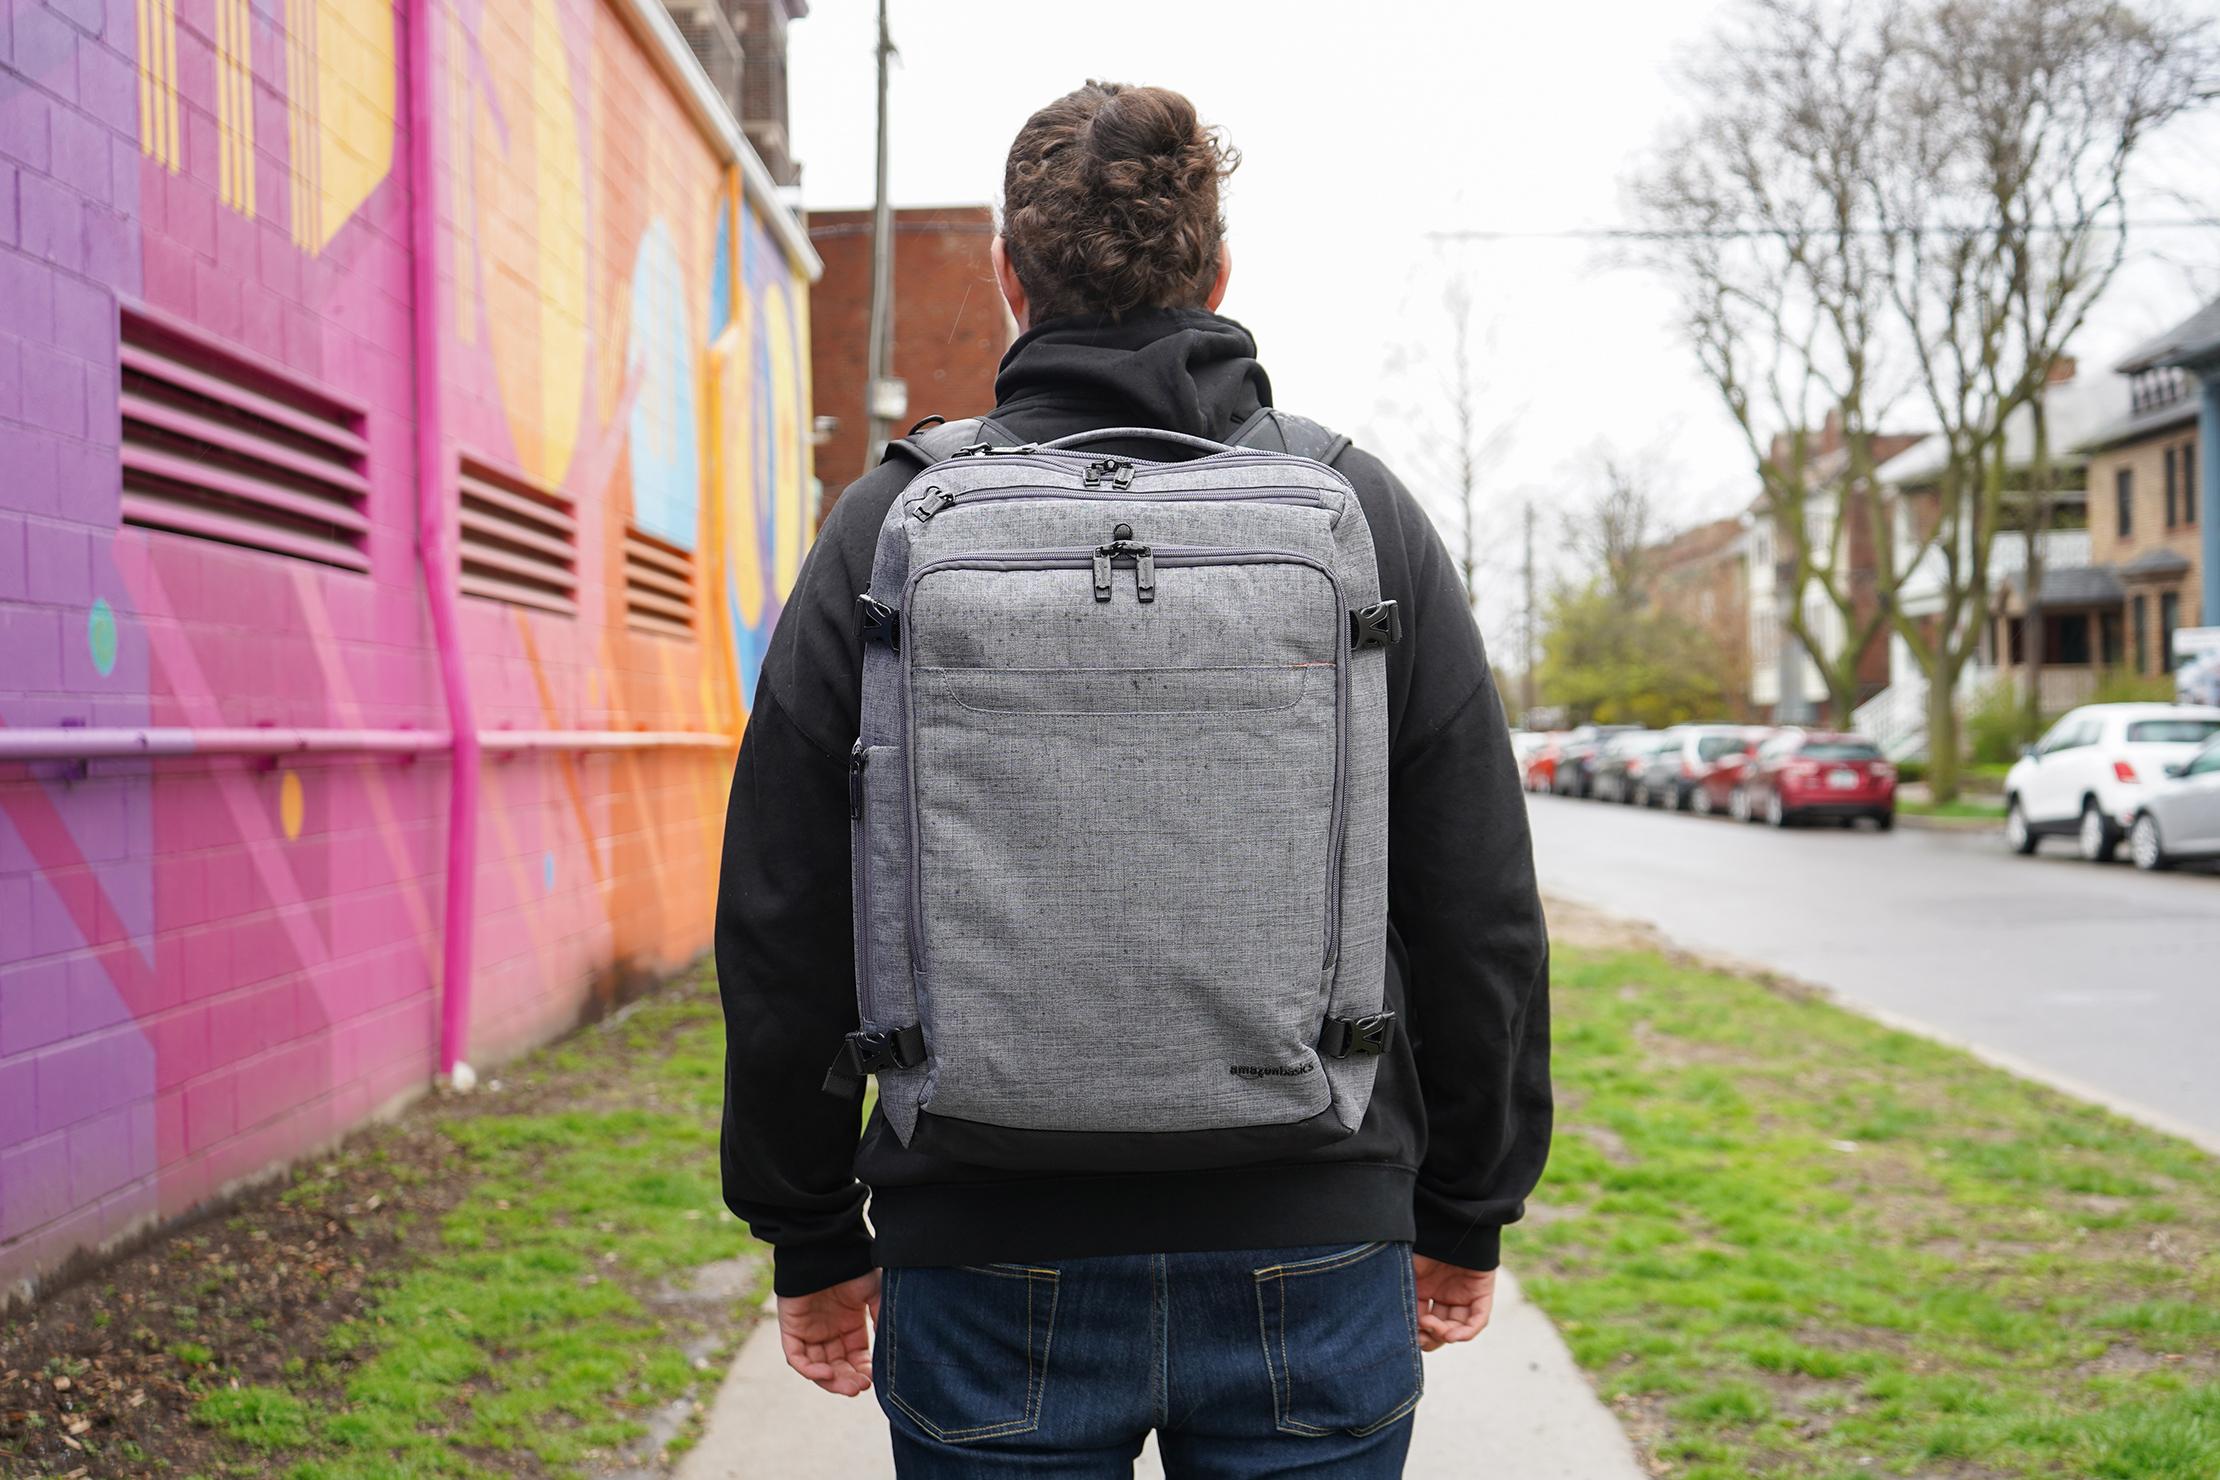 AmazonBasics Slim Travel Backpack Weekender In Detroit, Michigan